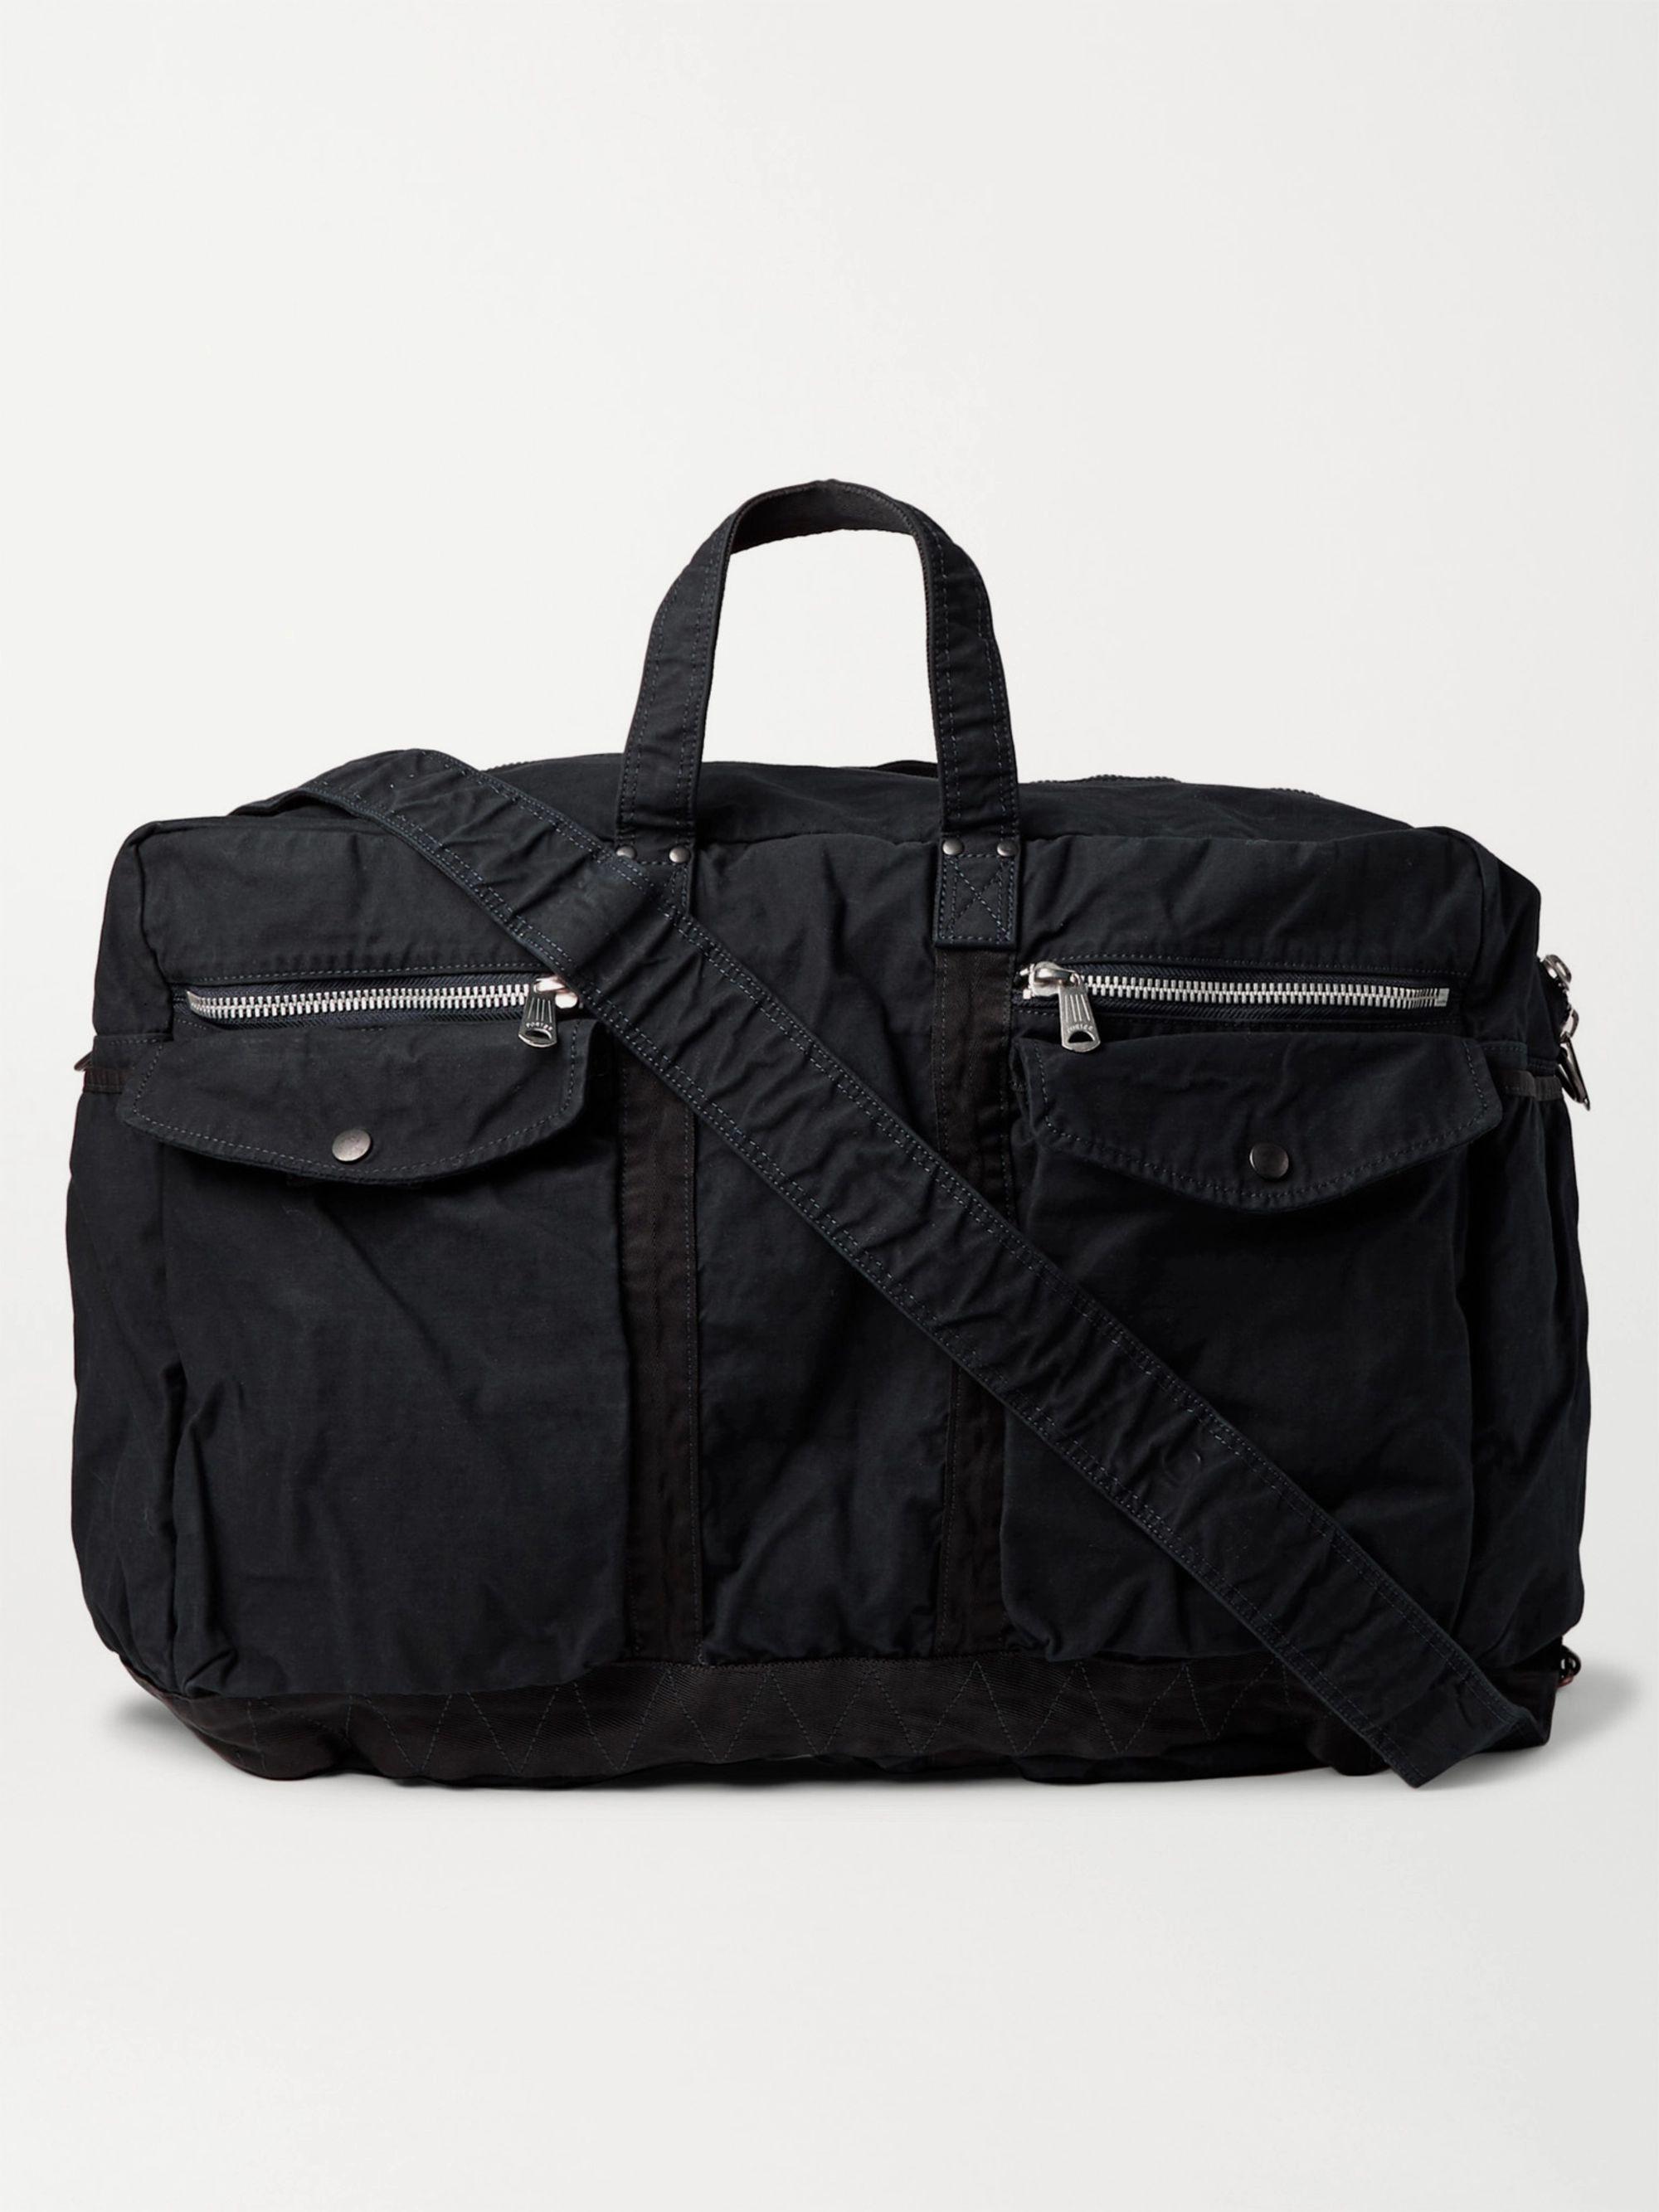 PORTER-YOSHIDA & CO 2Way Large Canvas Duffle Bag,Midnight blue